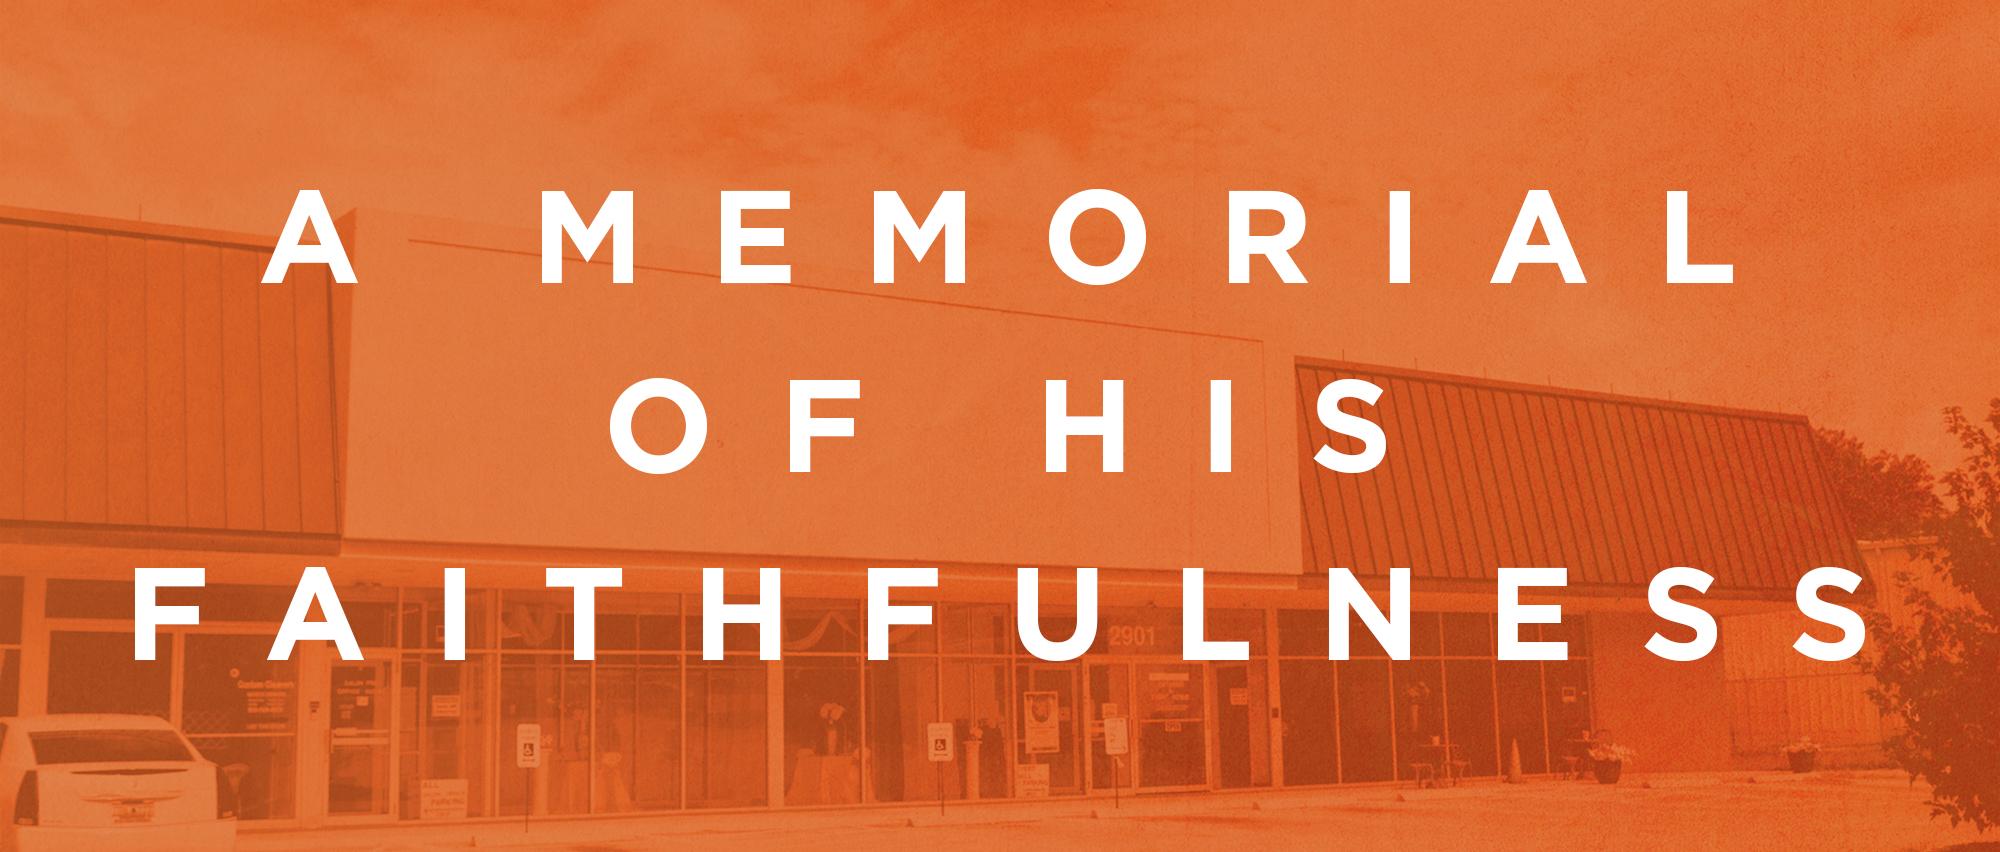 A Memorial Of His Faithfulness WEB.jpg